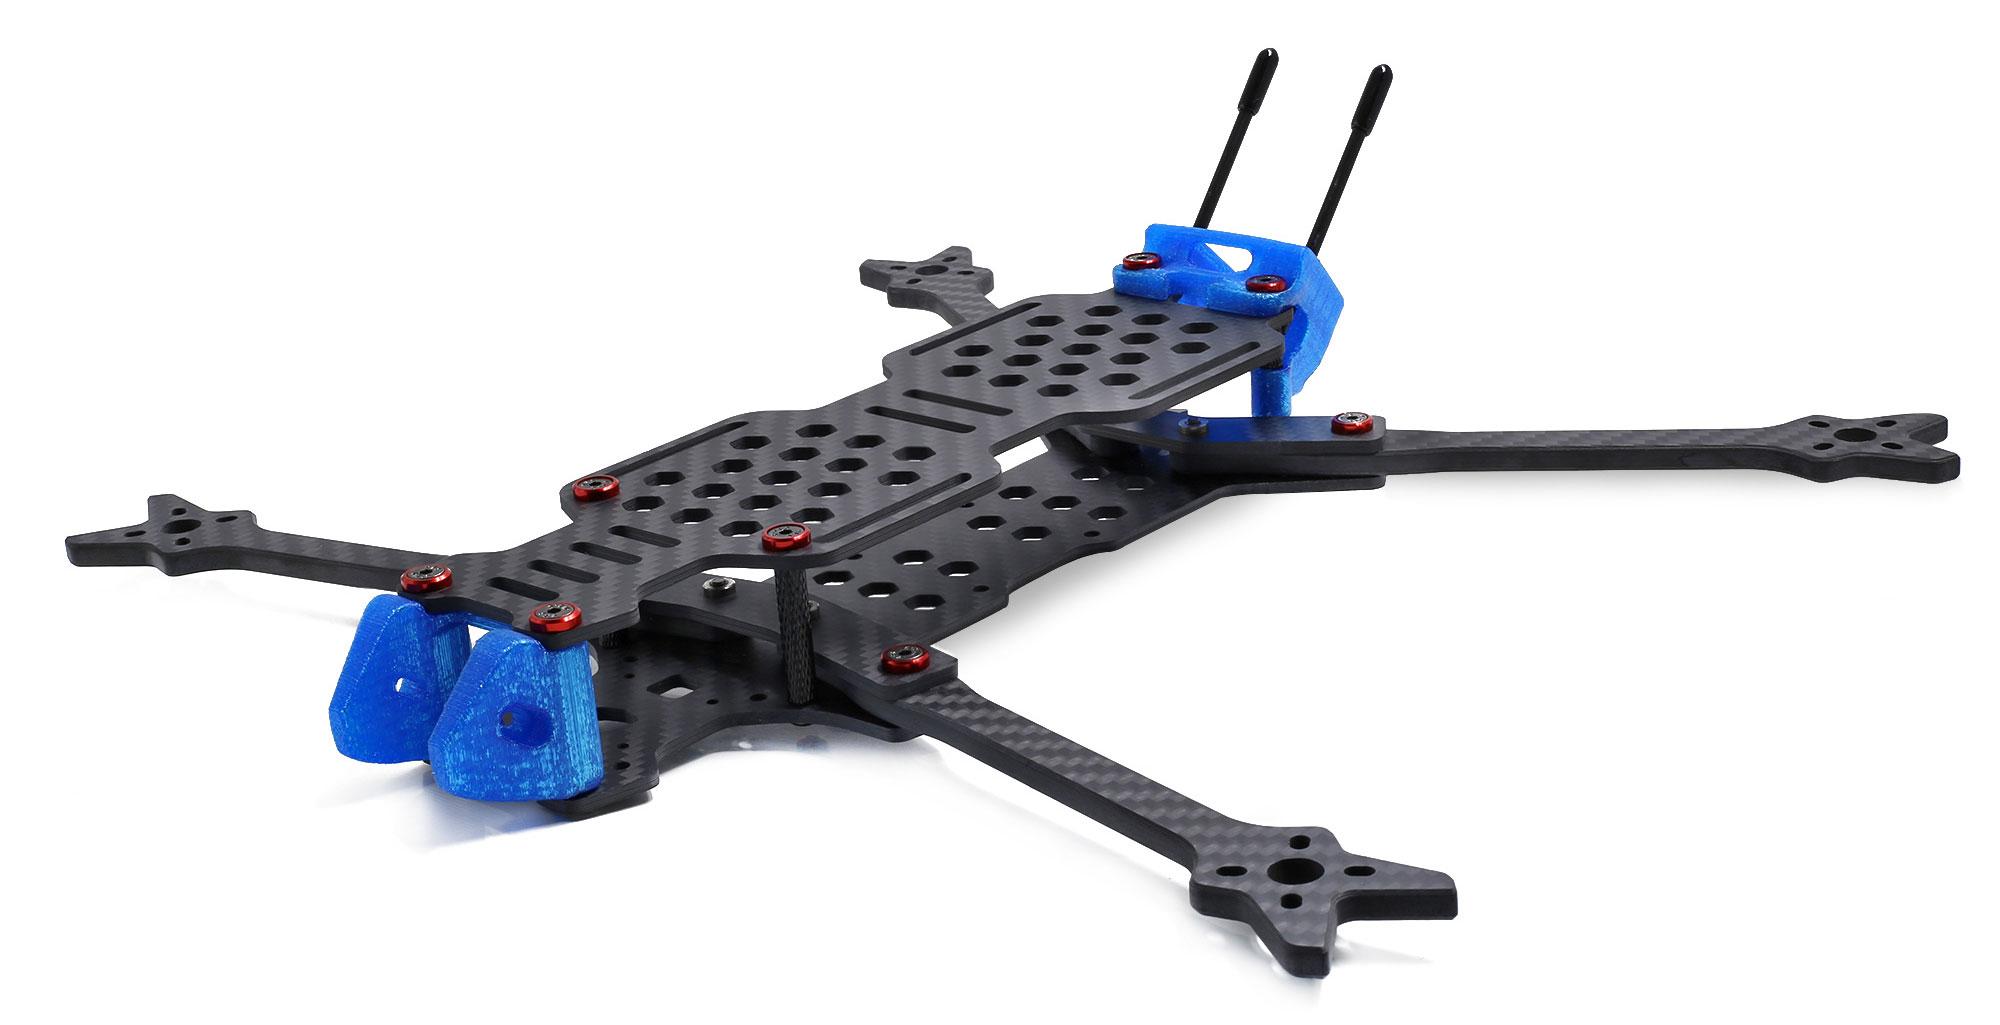 geprc-lc-7-drone-frame-long-range_2.jpg